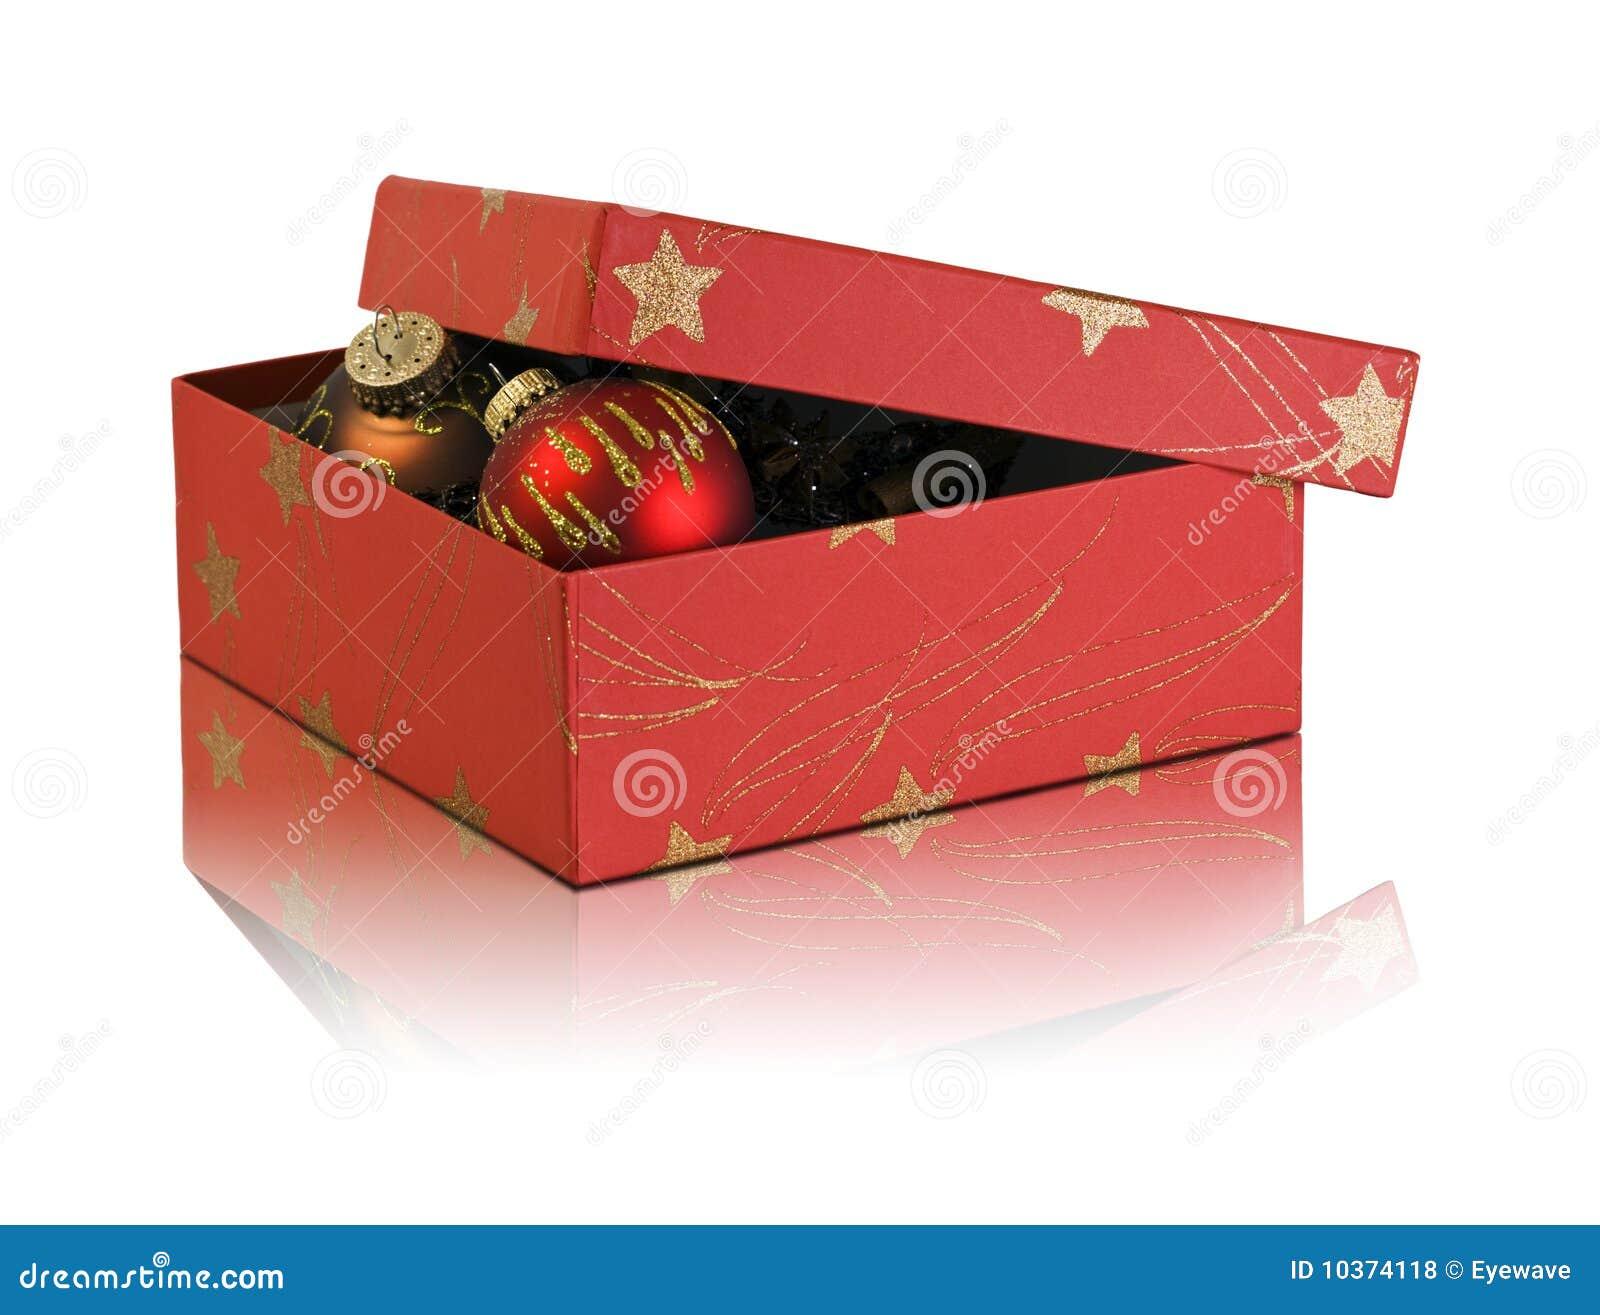 Bo te en carton avec la d coration de no l photos libres de droits image 1 - Decoration boite carton ...